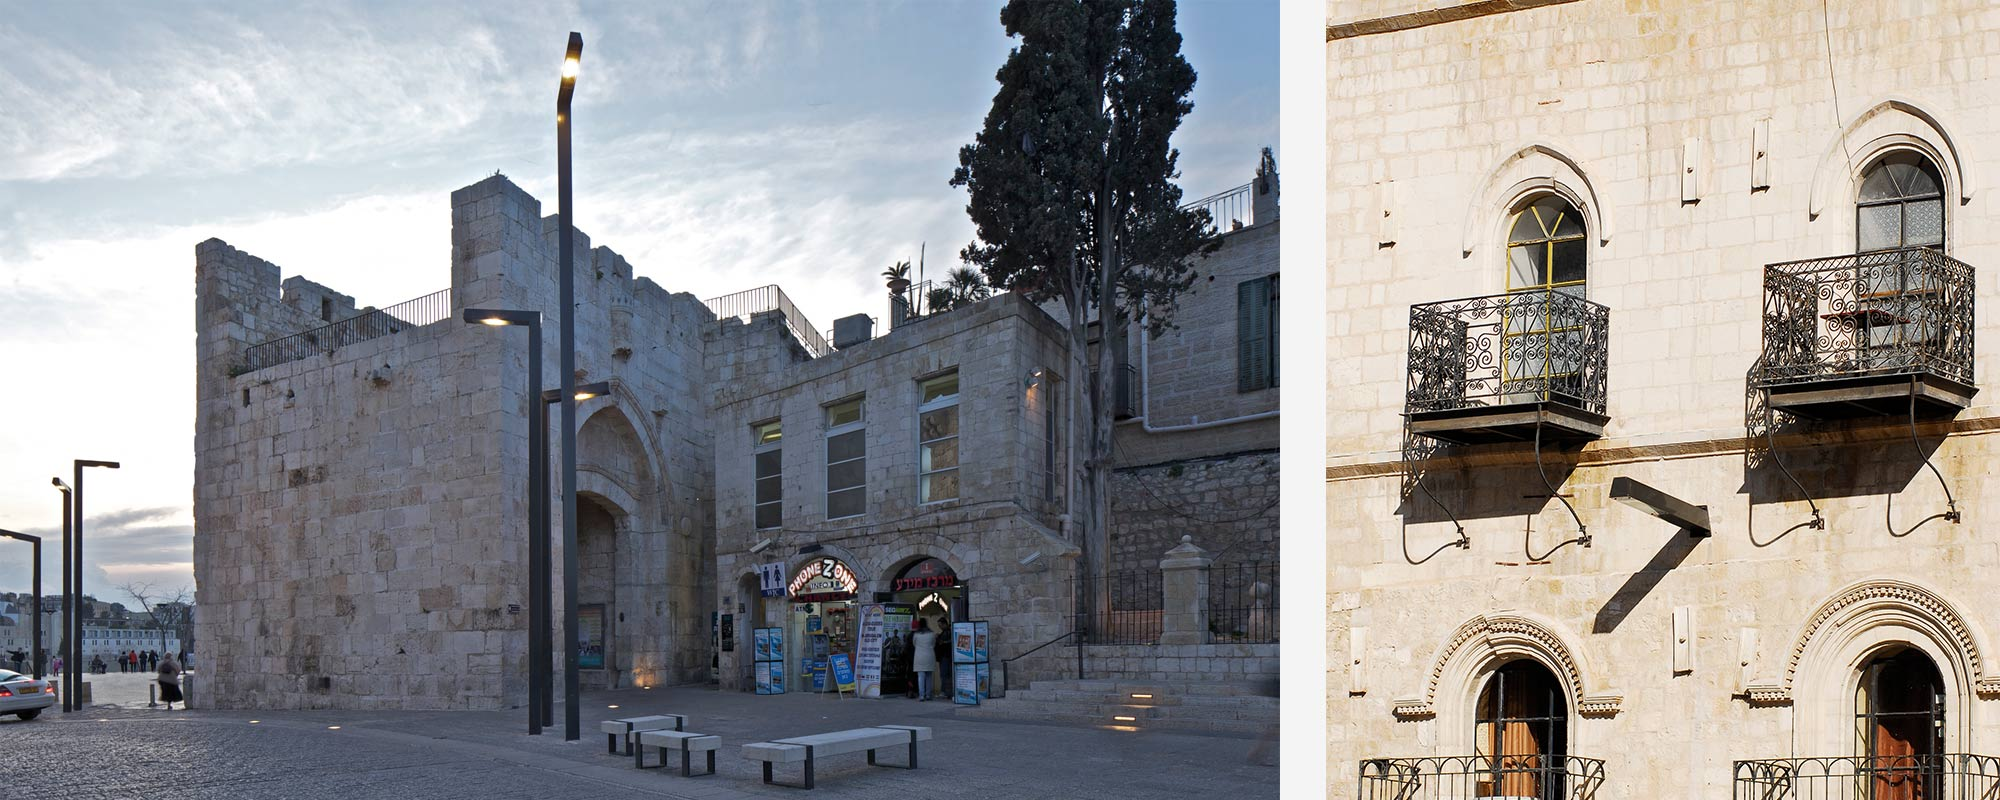 D_Jerusalem_Jaffa-gate_2